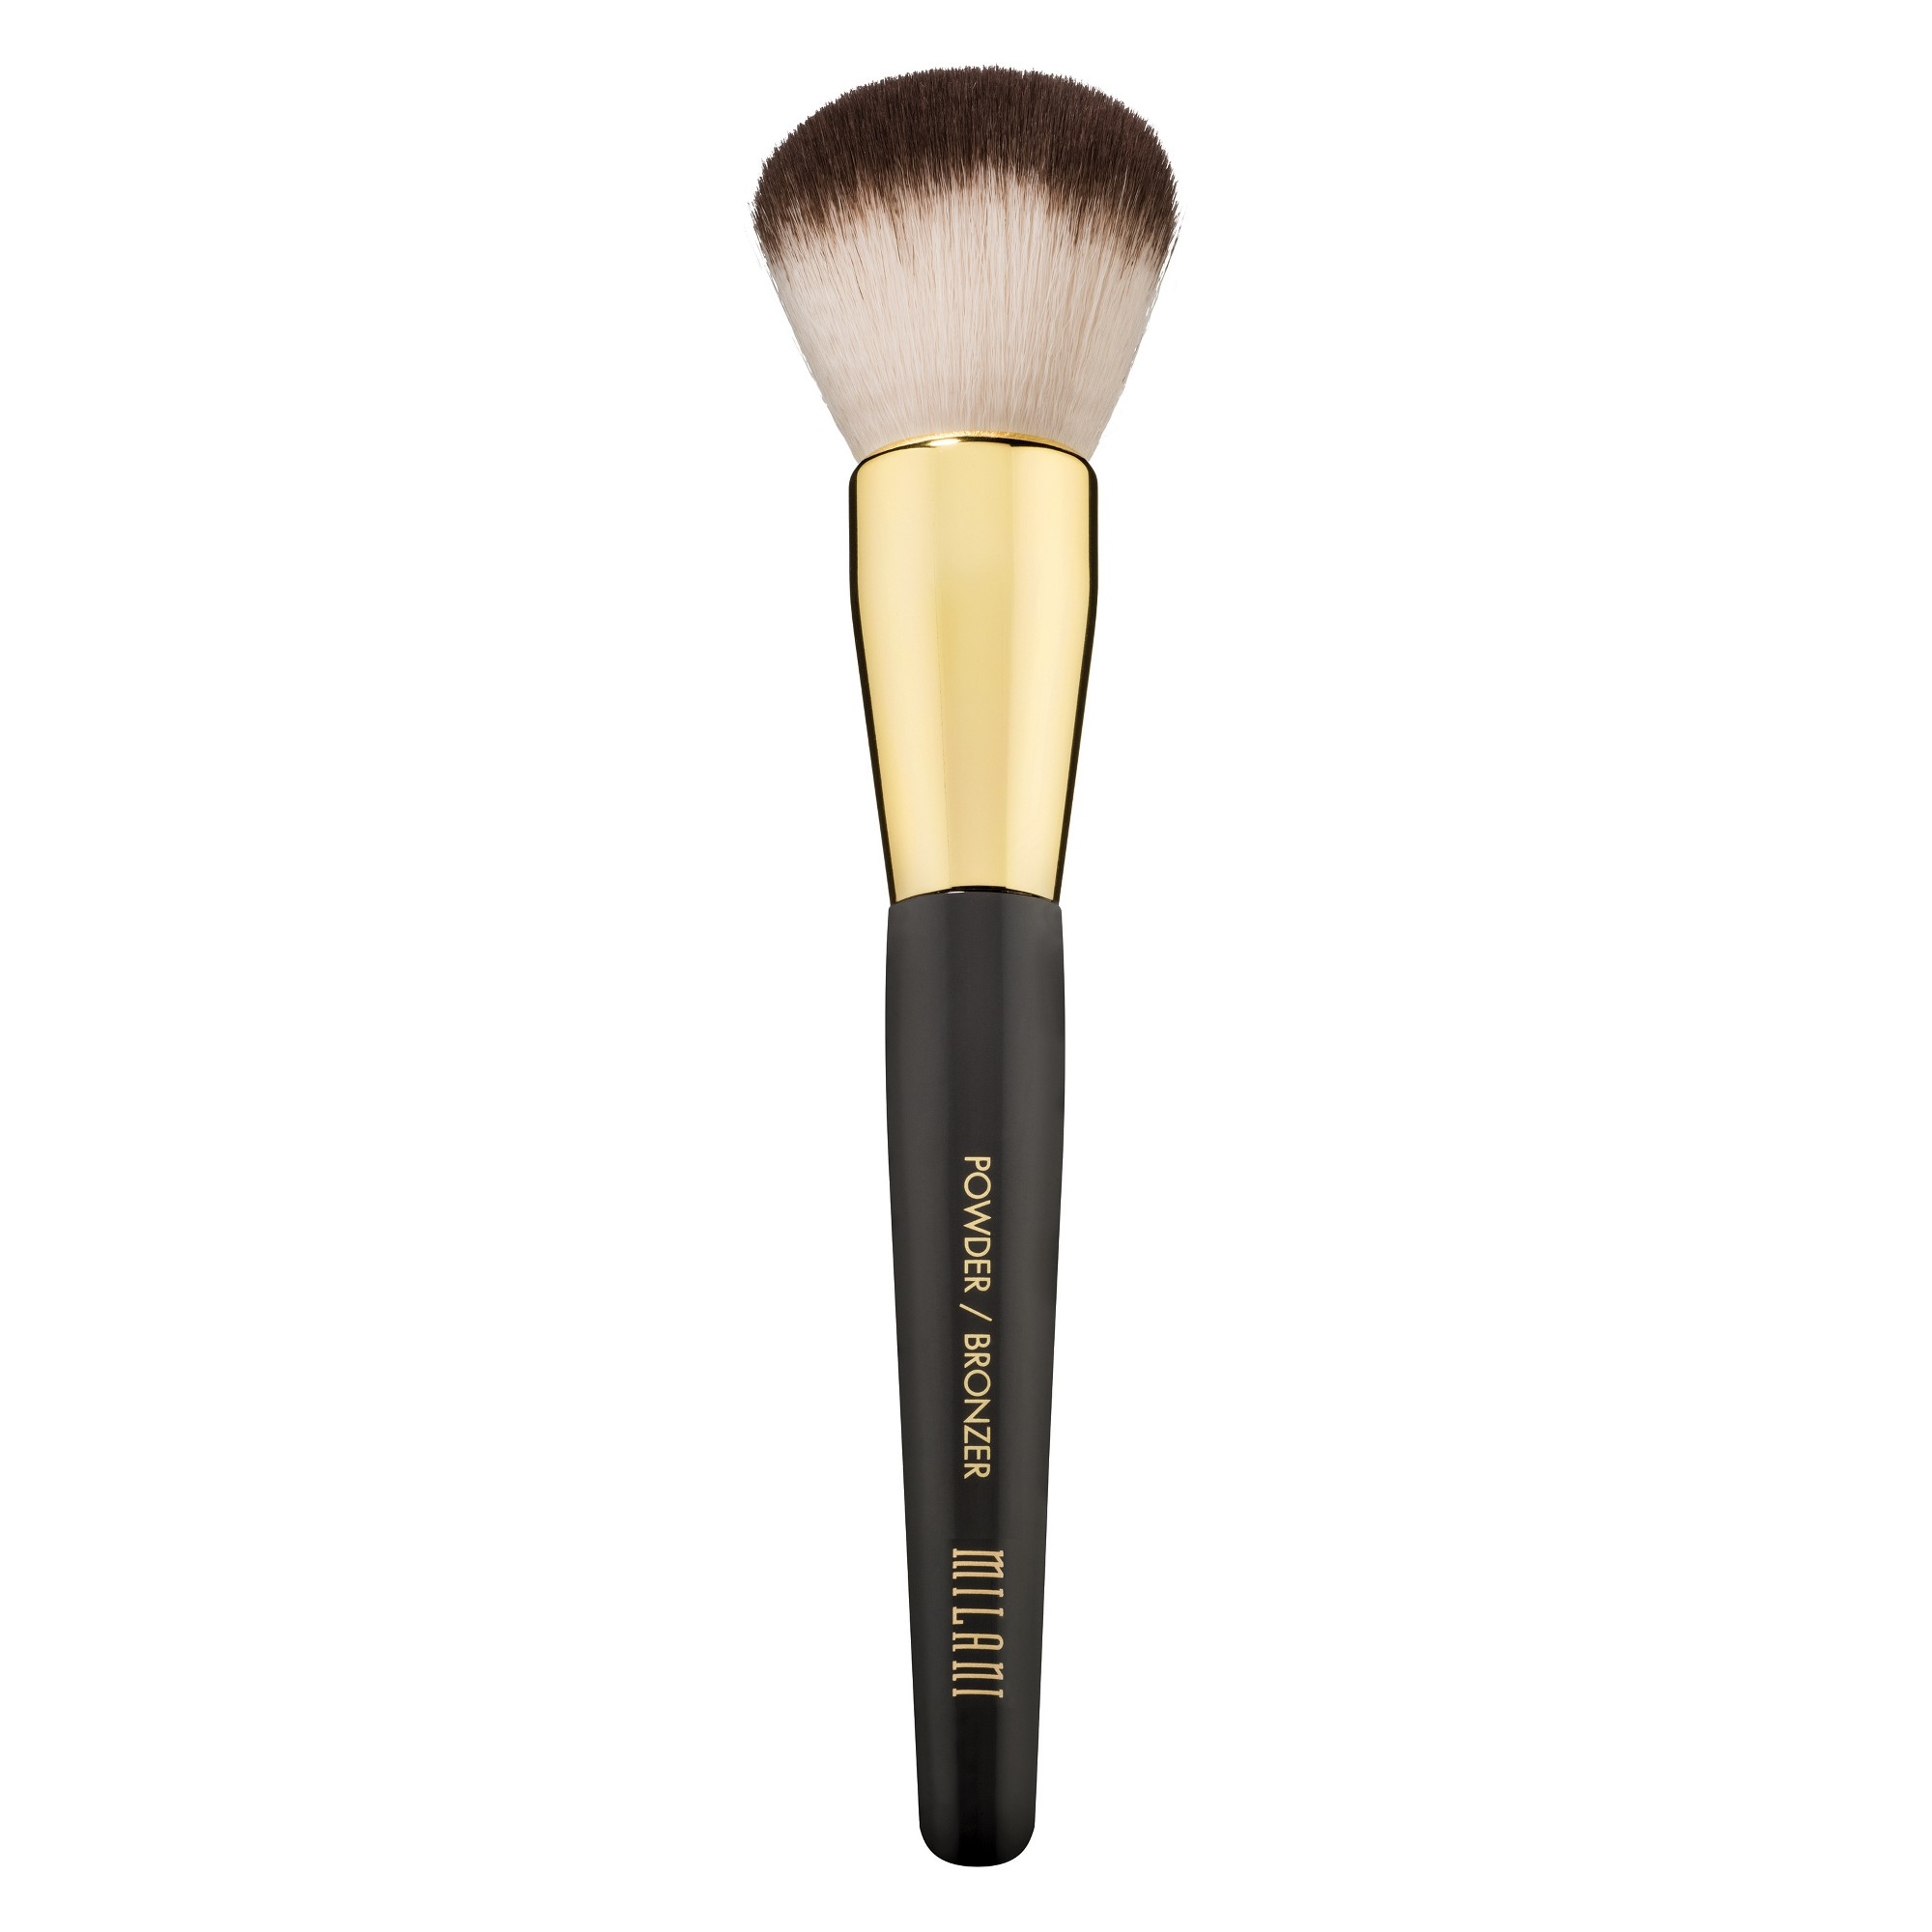 Milani Powder Bronzer Brush, MultiColored Bronzer